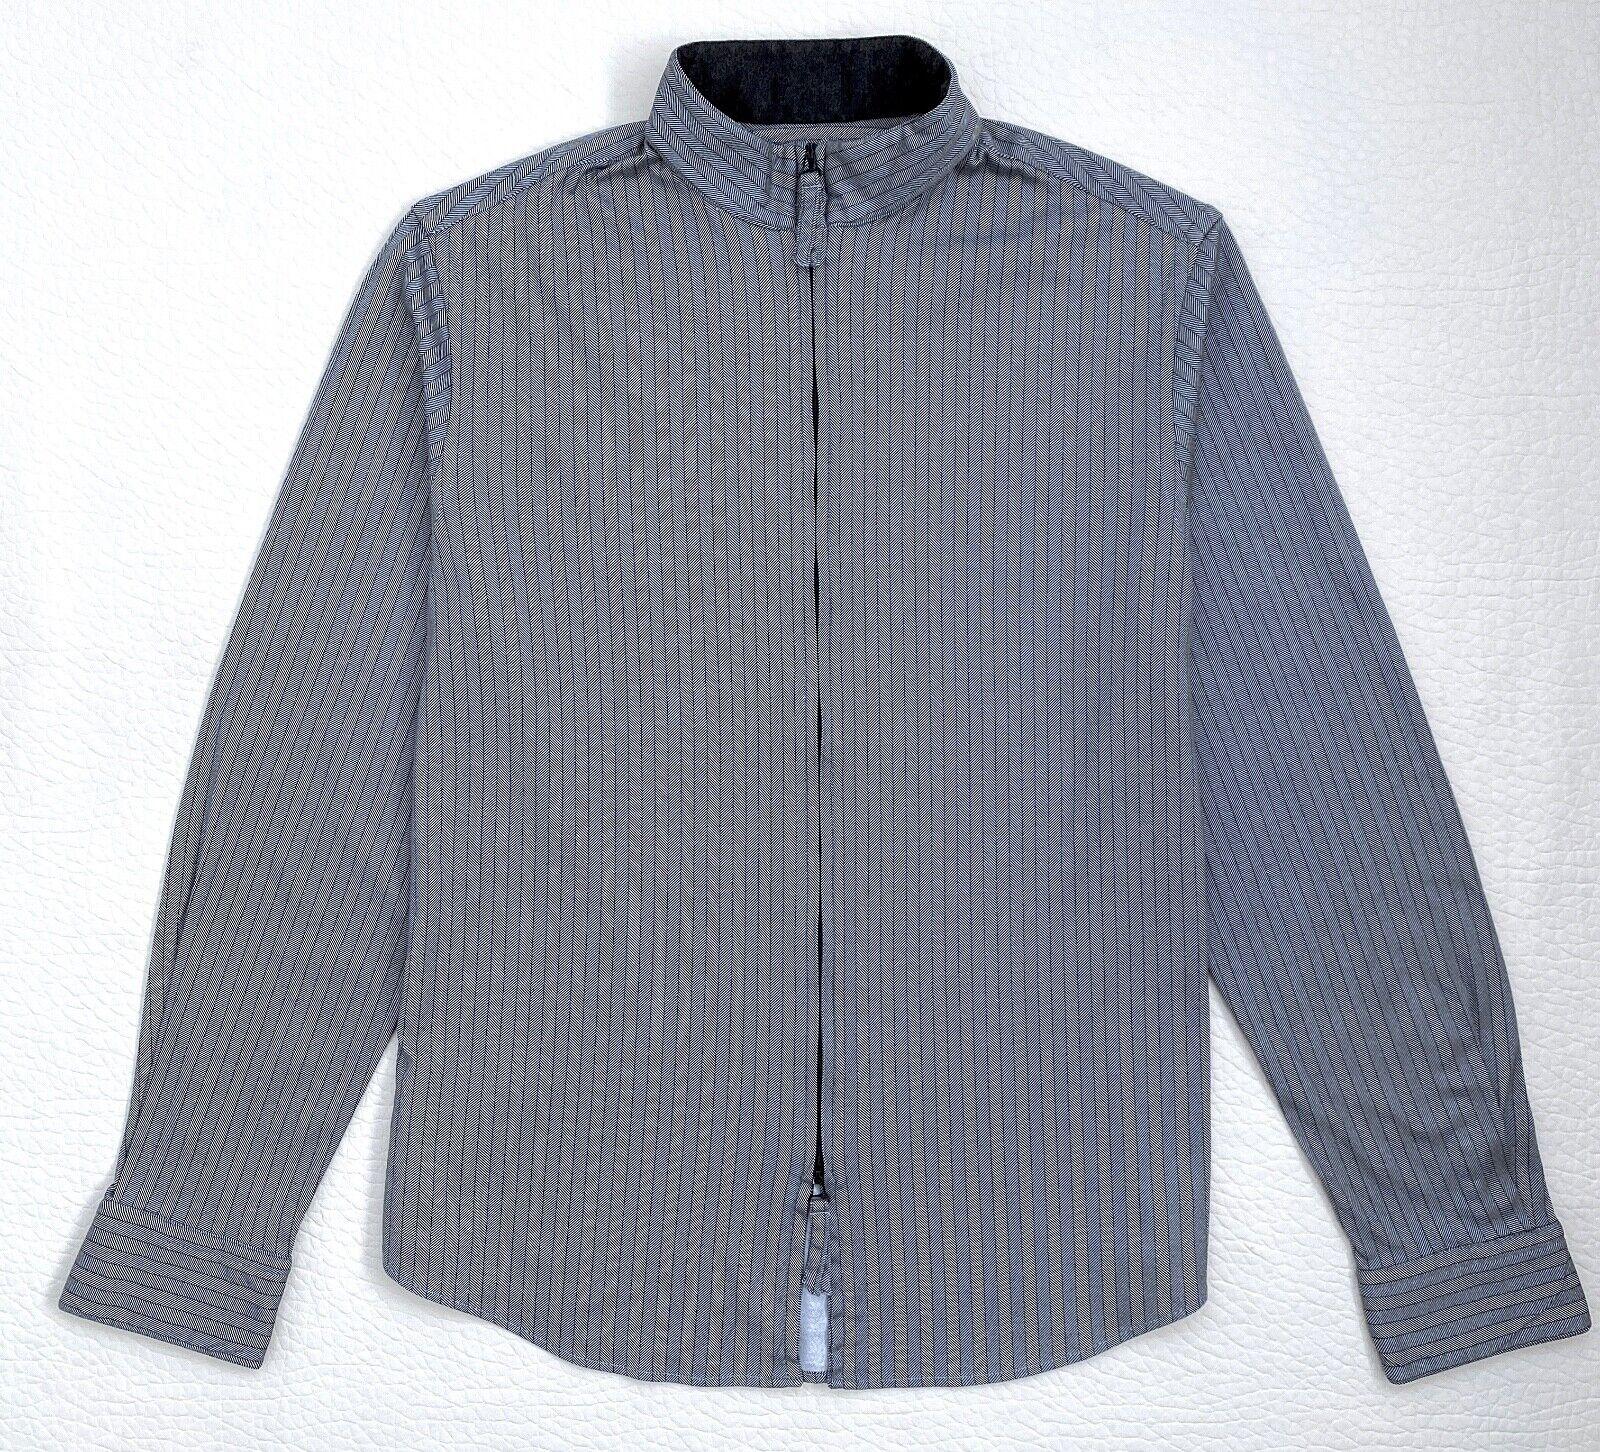 Giorgio Armani Collarless Slim Fit Shirt Sz.42-16.5